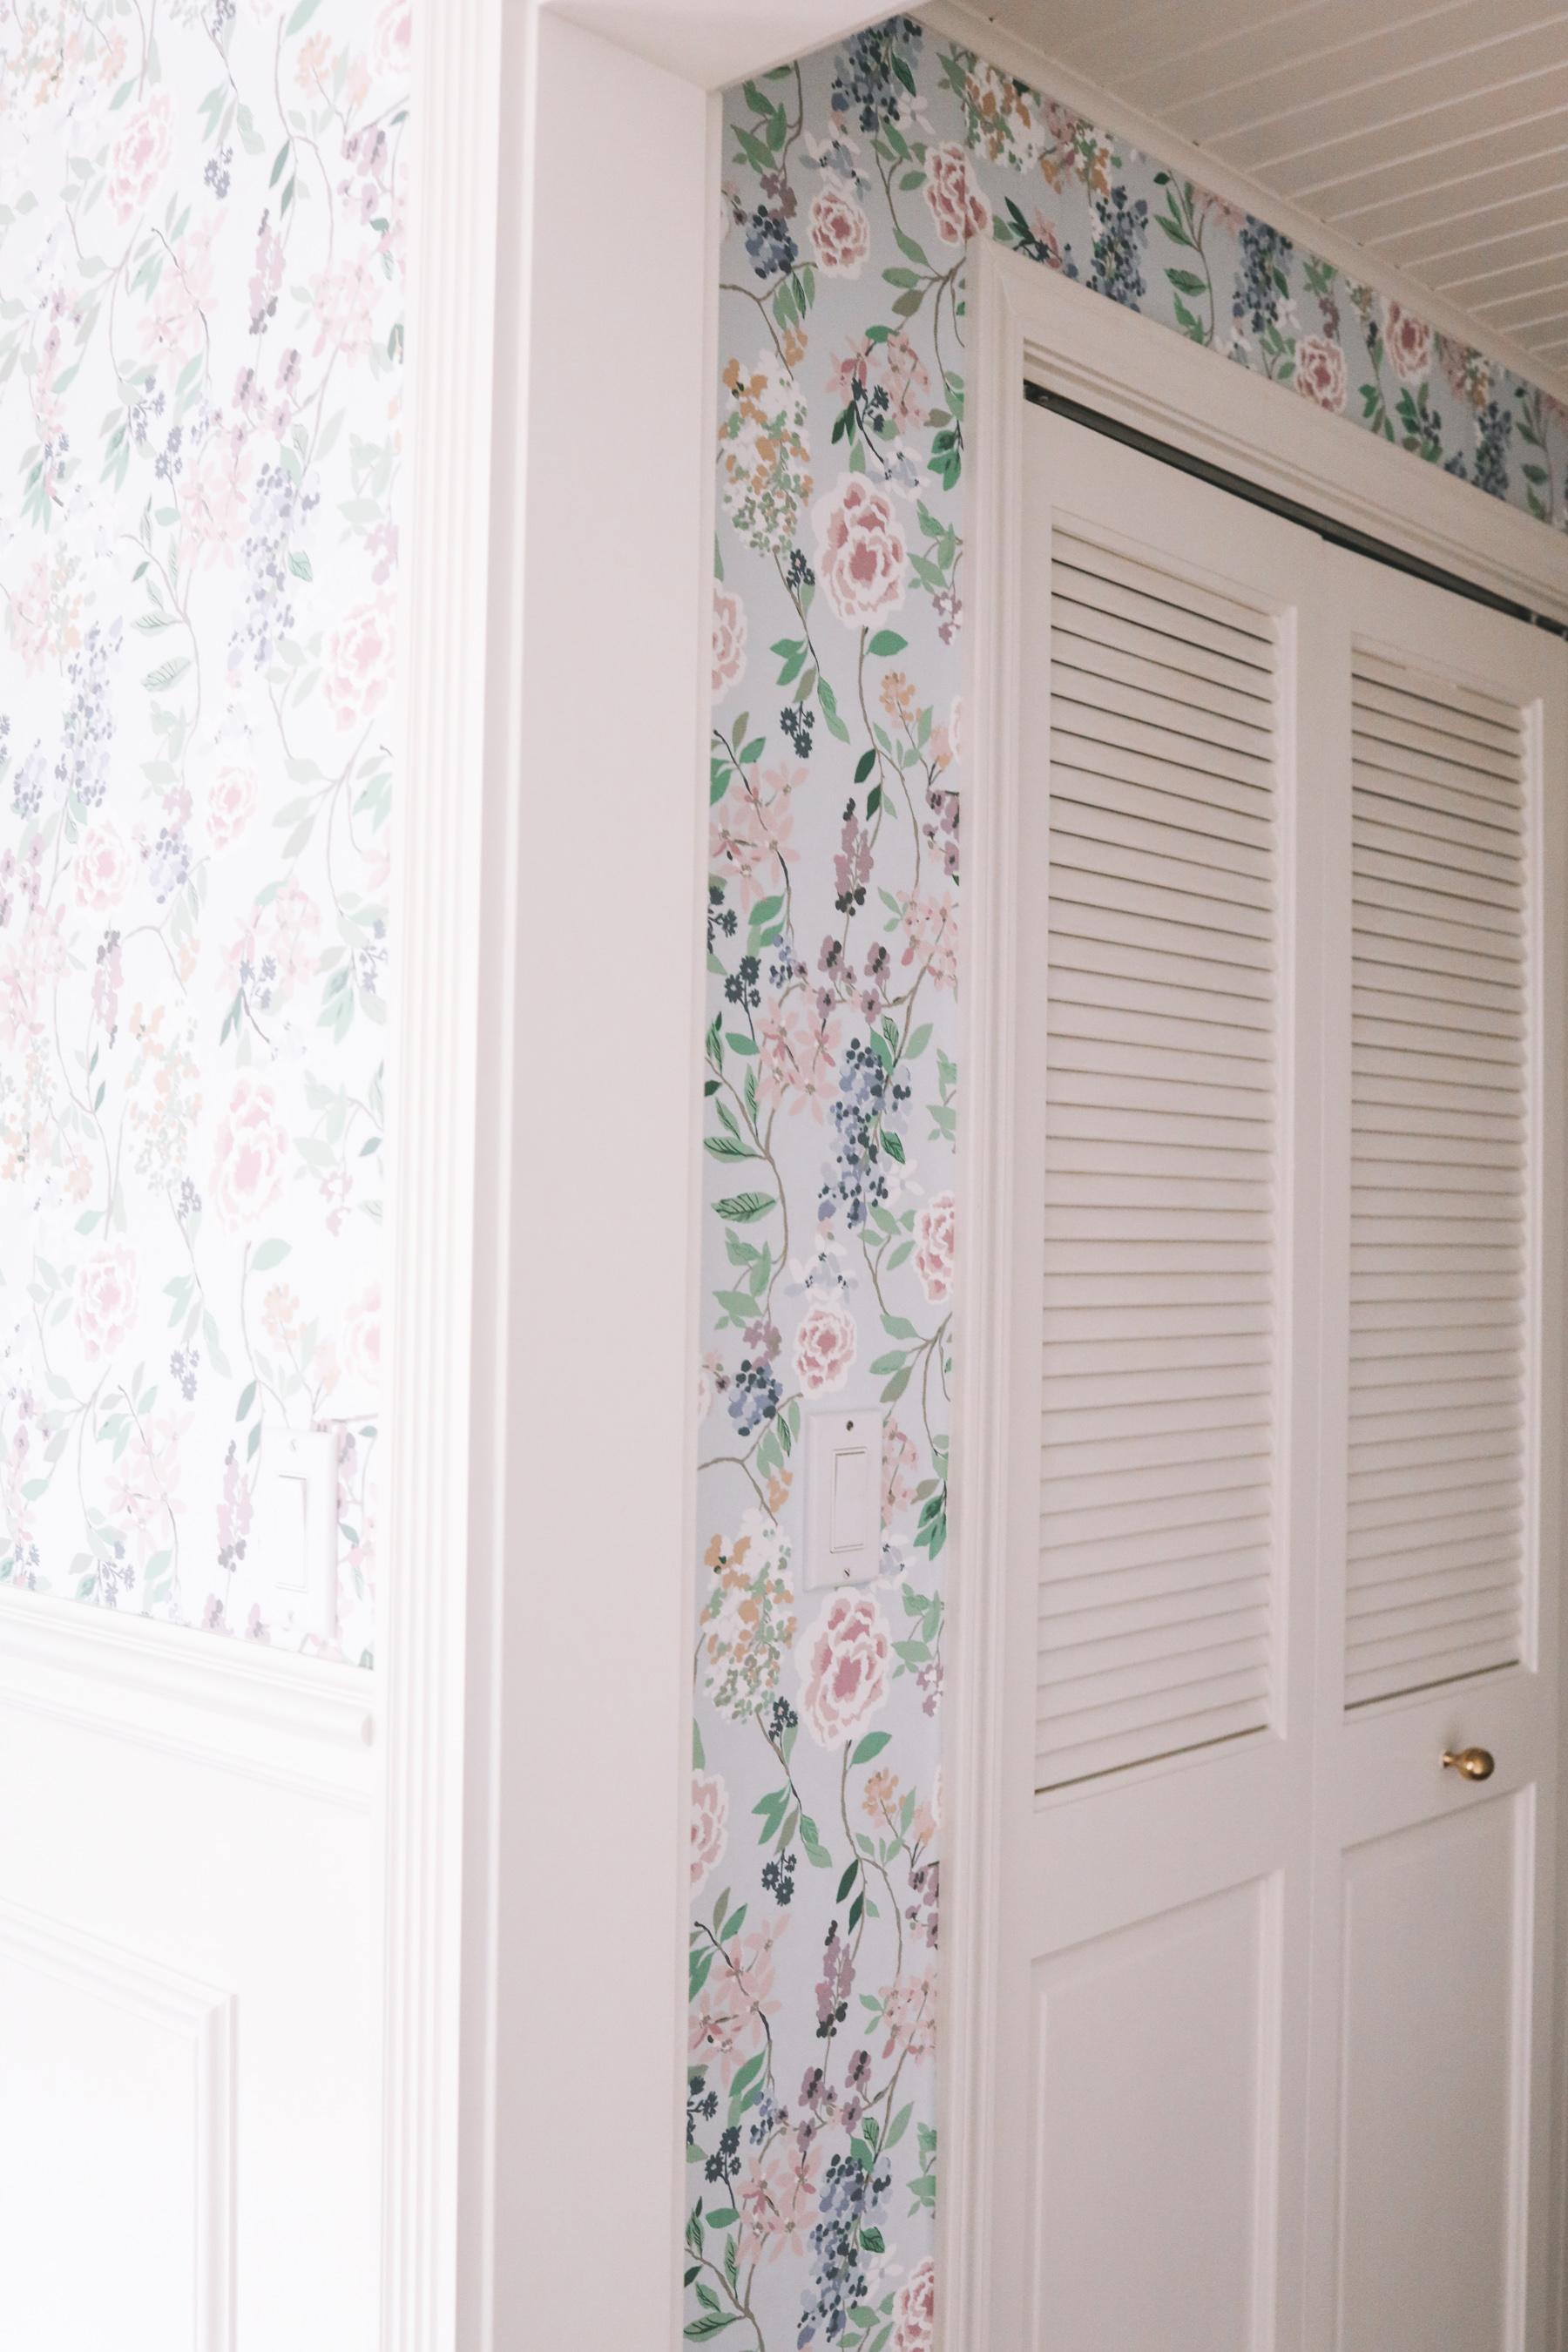 Brooke & Lou wallpaper